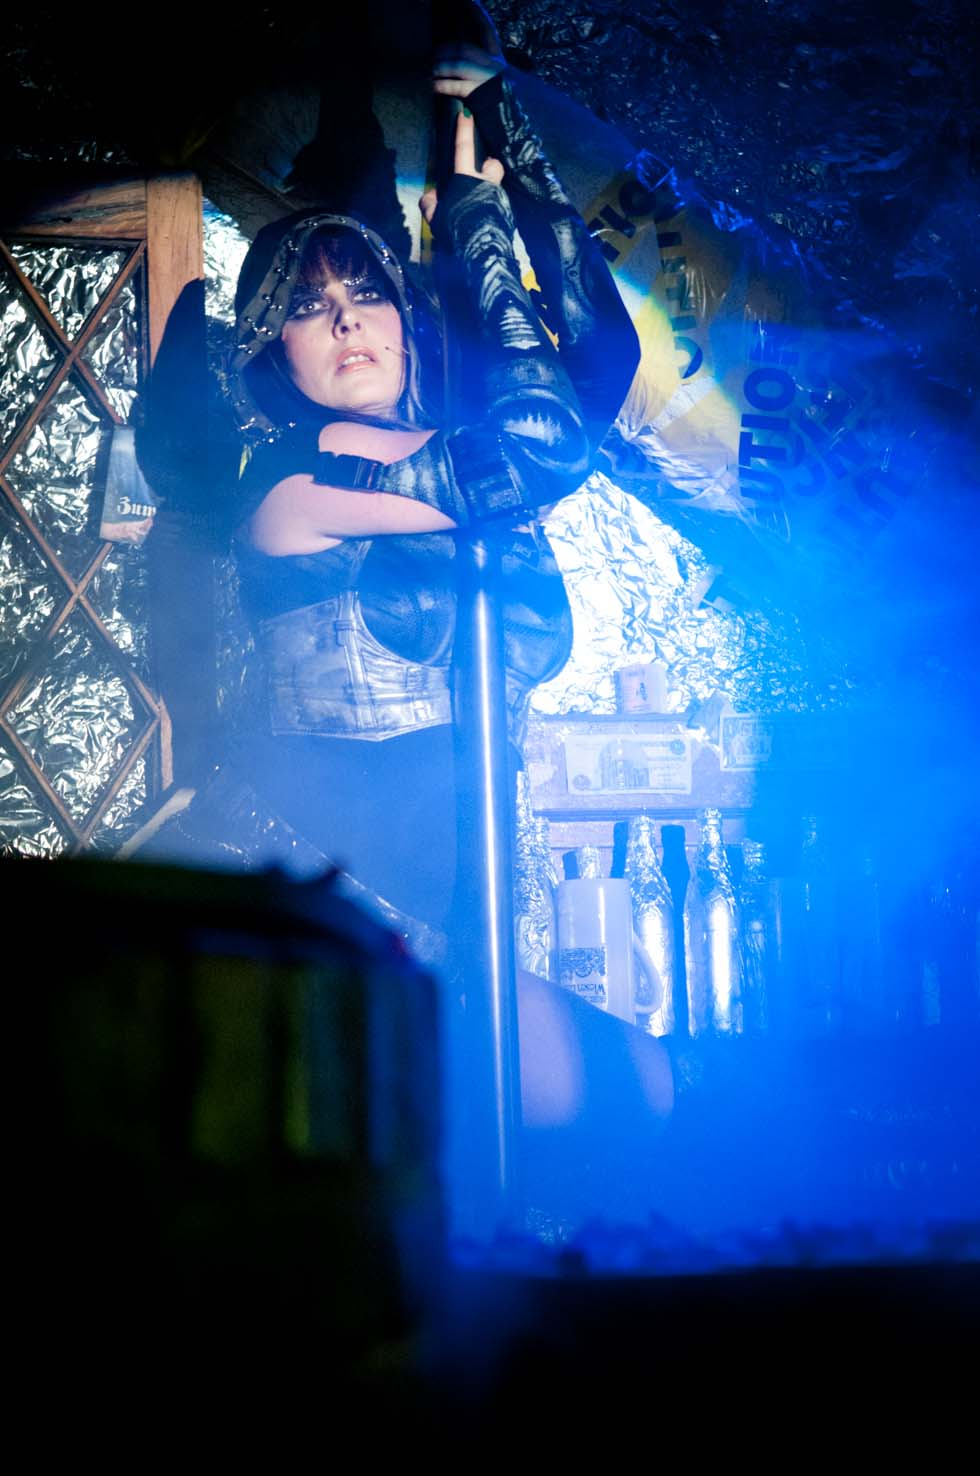 zum-schneider-nyc-2012-karneval-apocalyptika-3312.jpg